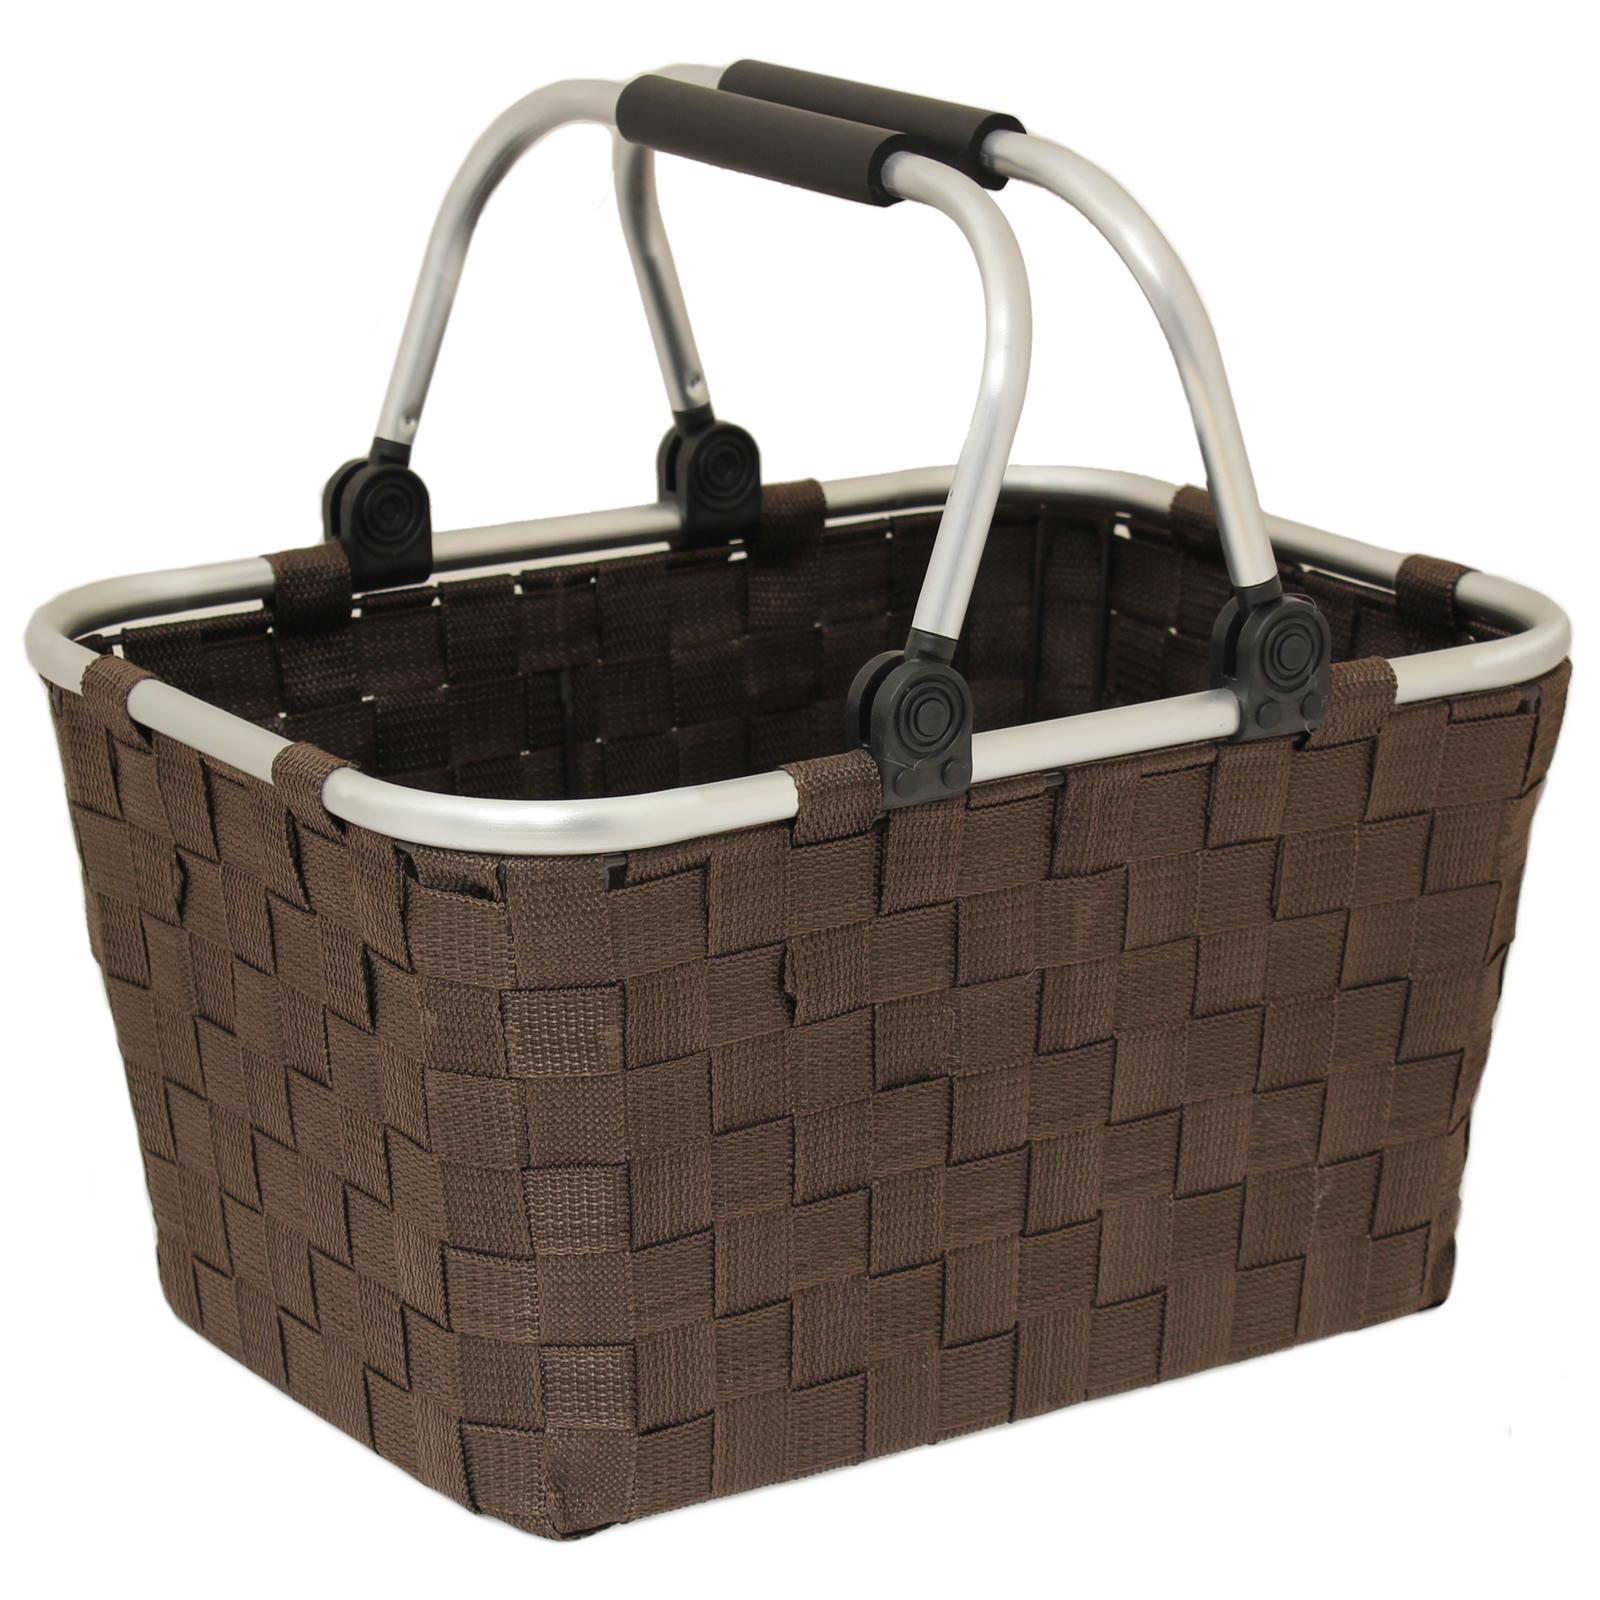 Woven Shopping Basket Uk : Strong woven material aluminium ping storage handle